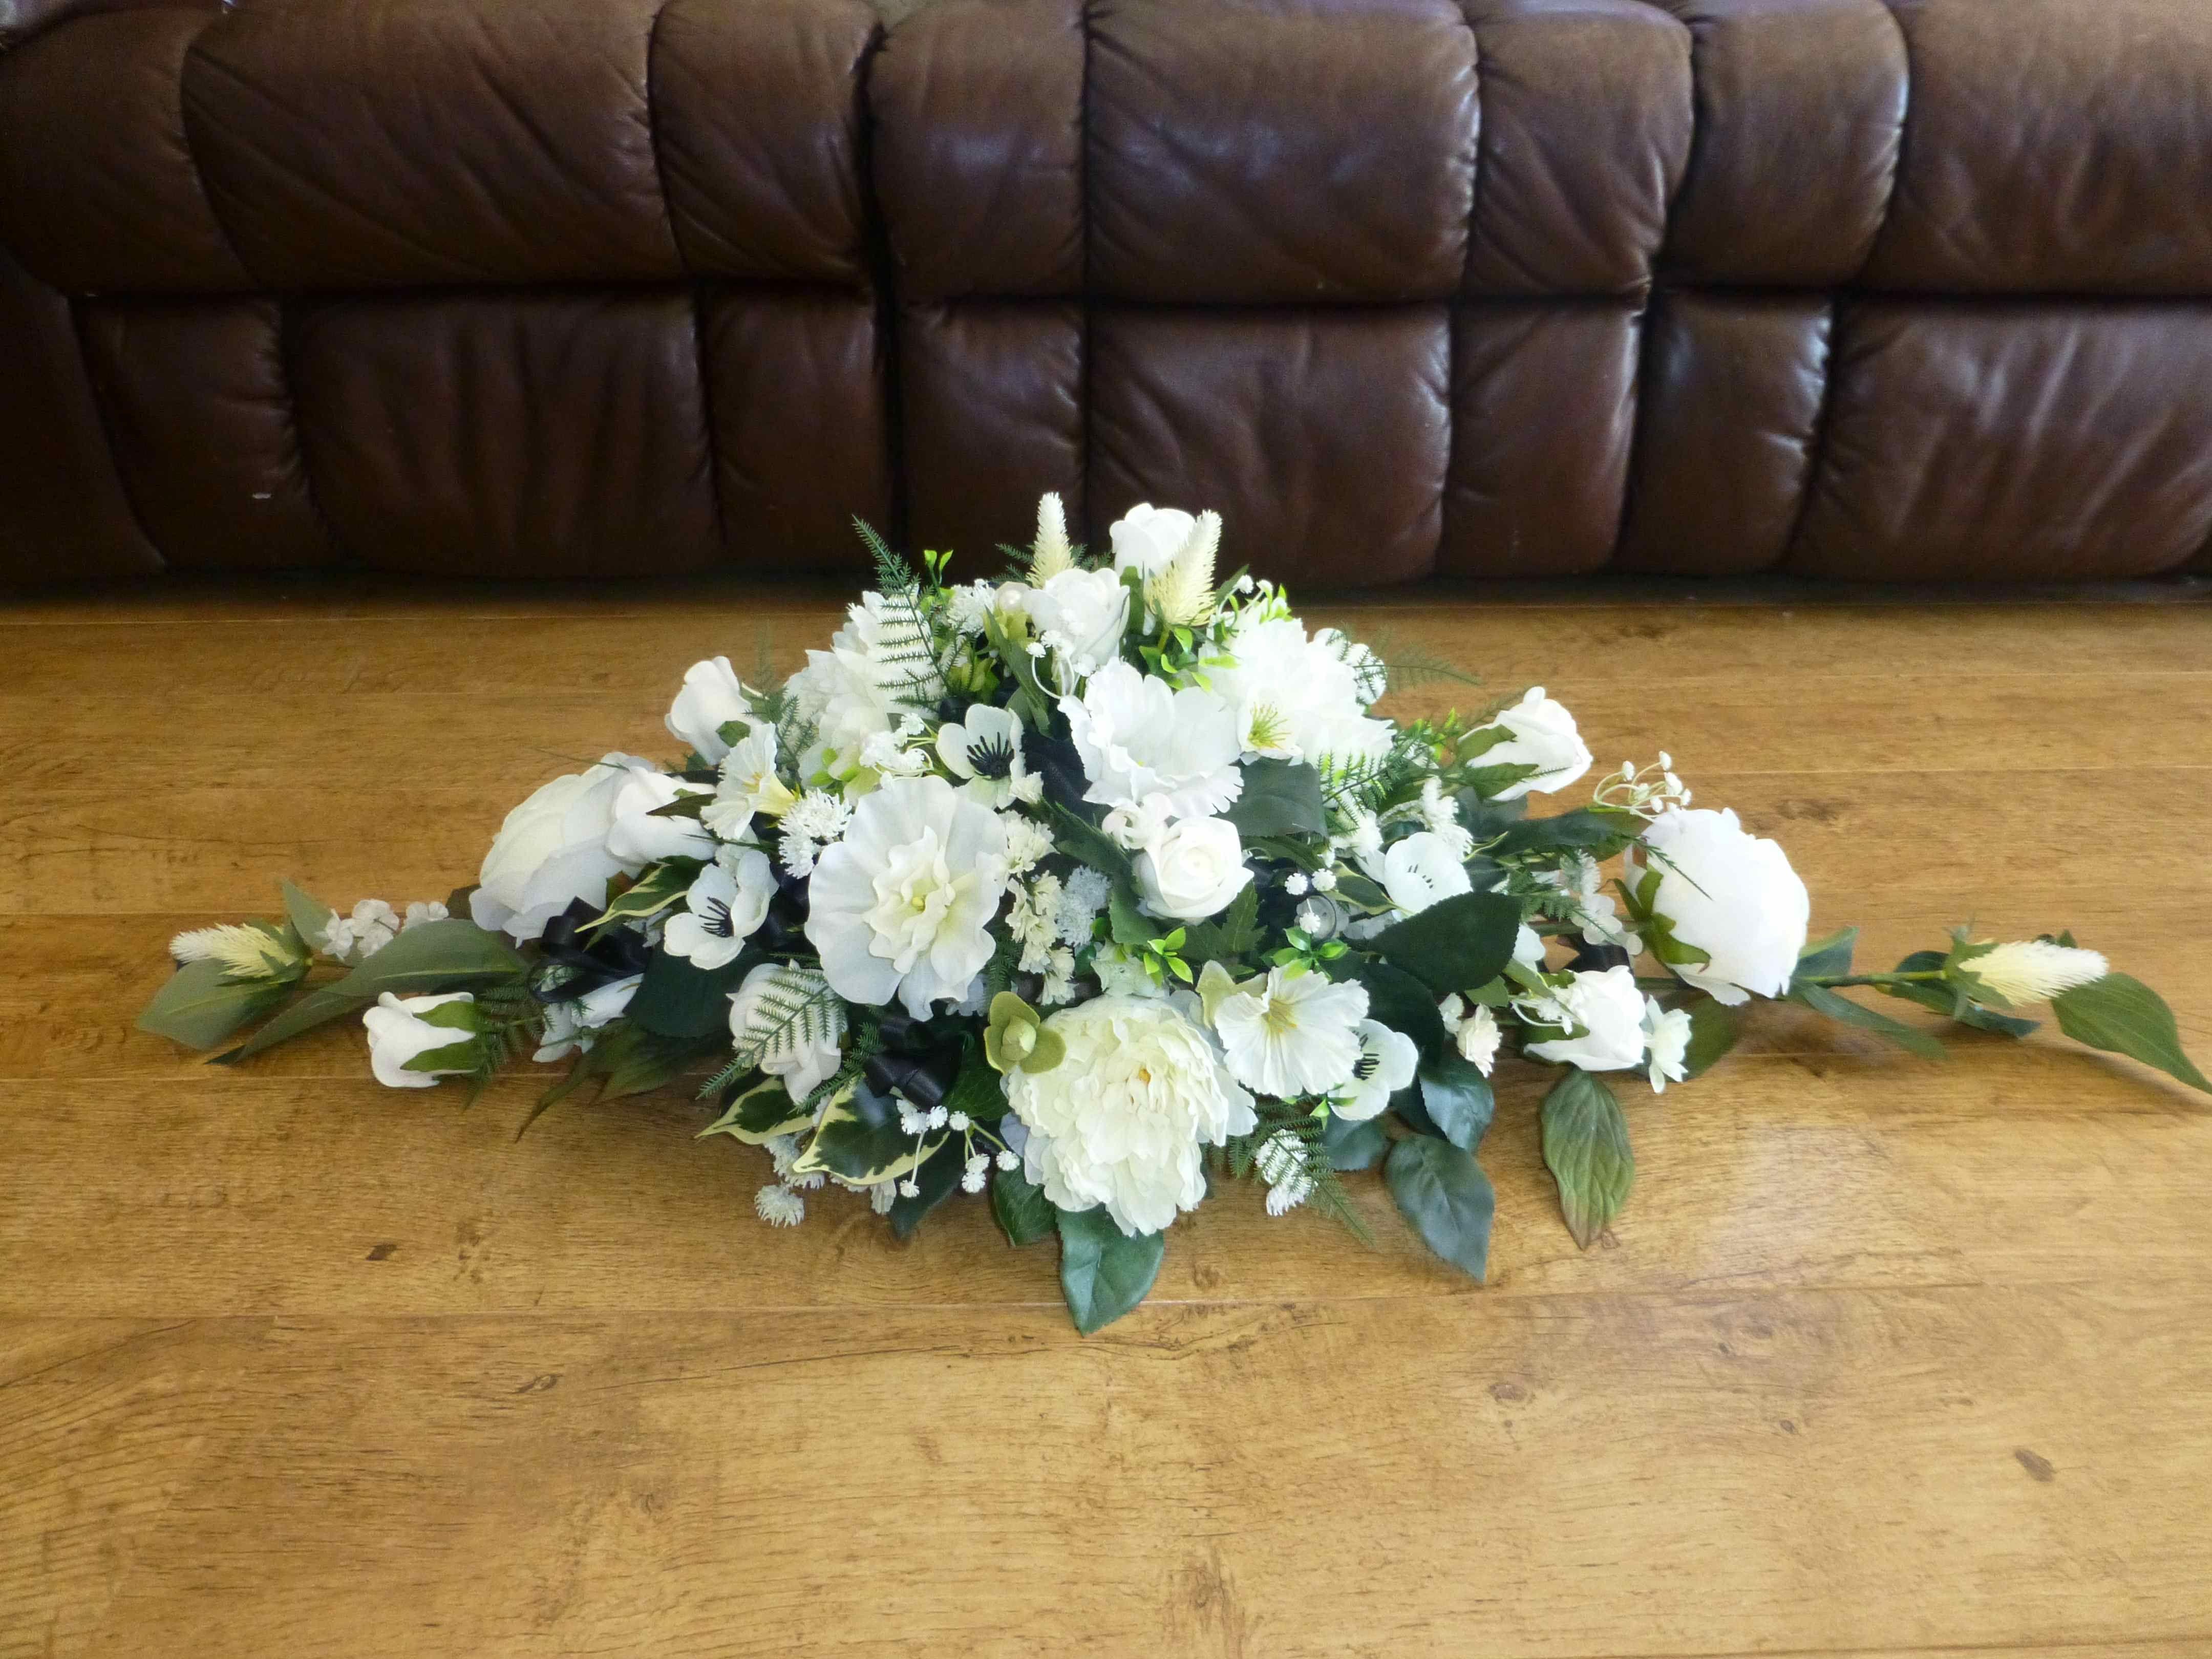 Artificial Flower Arrangement For Wedding Top Table Black White Hannah Ben Artificial Flower Arrangements Wedding Top Table Table Flowers